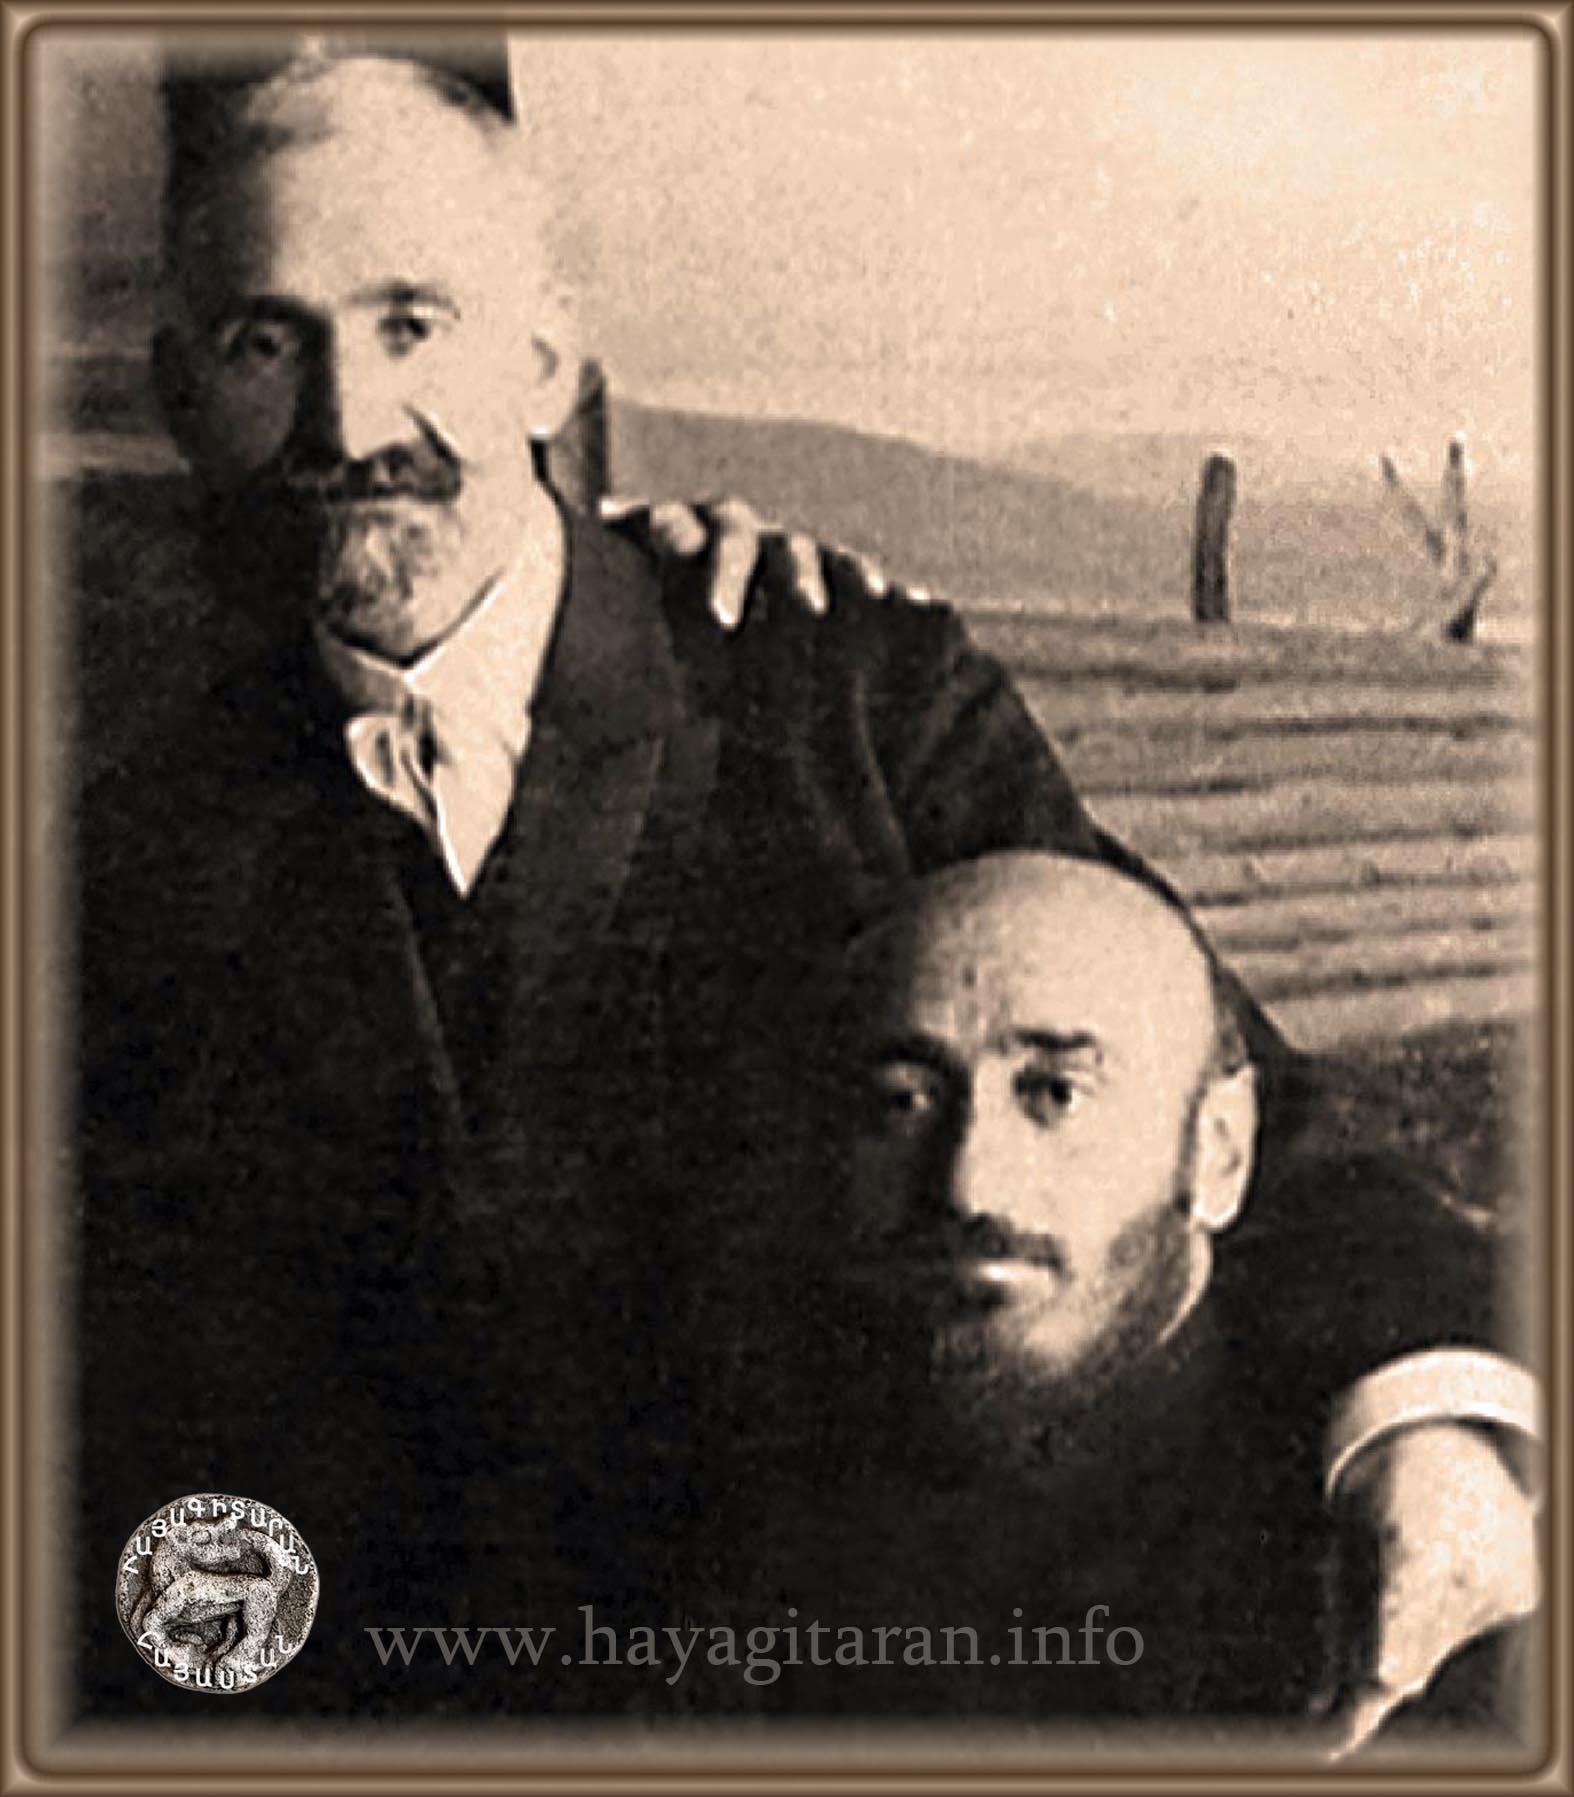 toumanyane-grkec-komitasin-ou-asac-hima-vstah-em--hay-joxovourde-e-nra-erge-kapri-daredar